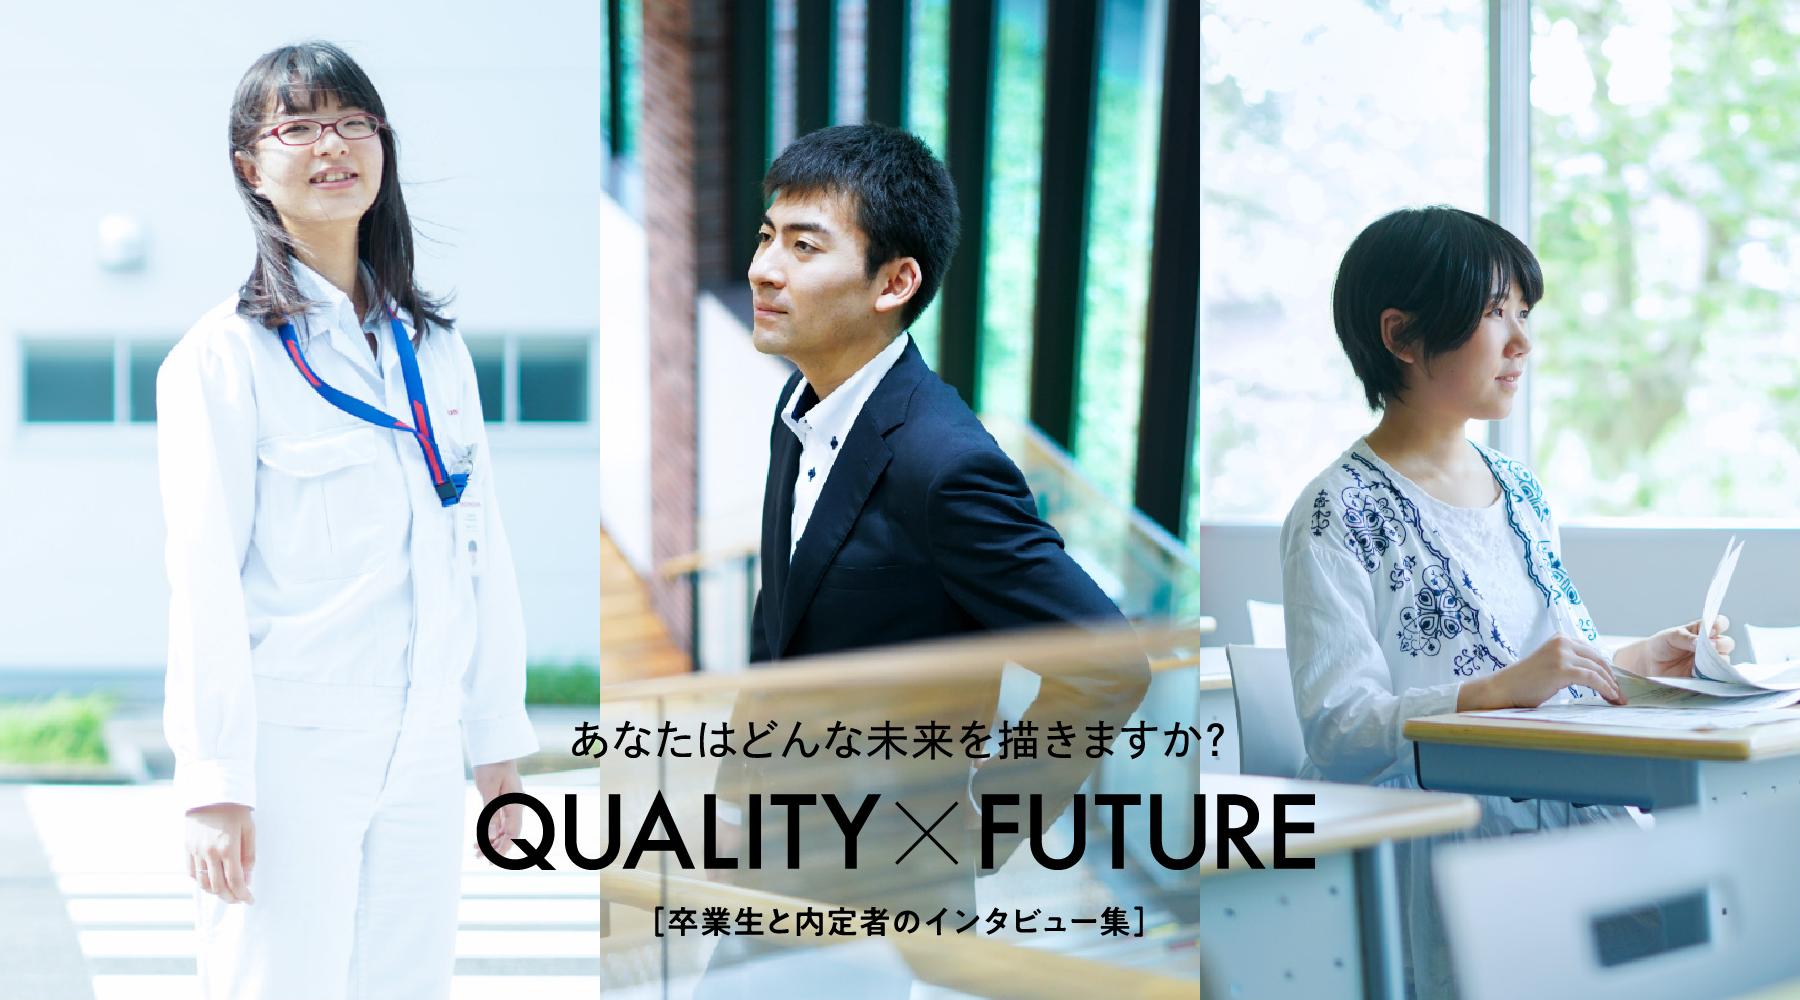 Quality × Future